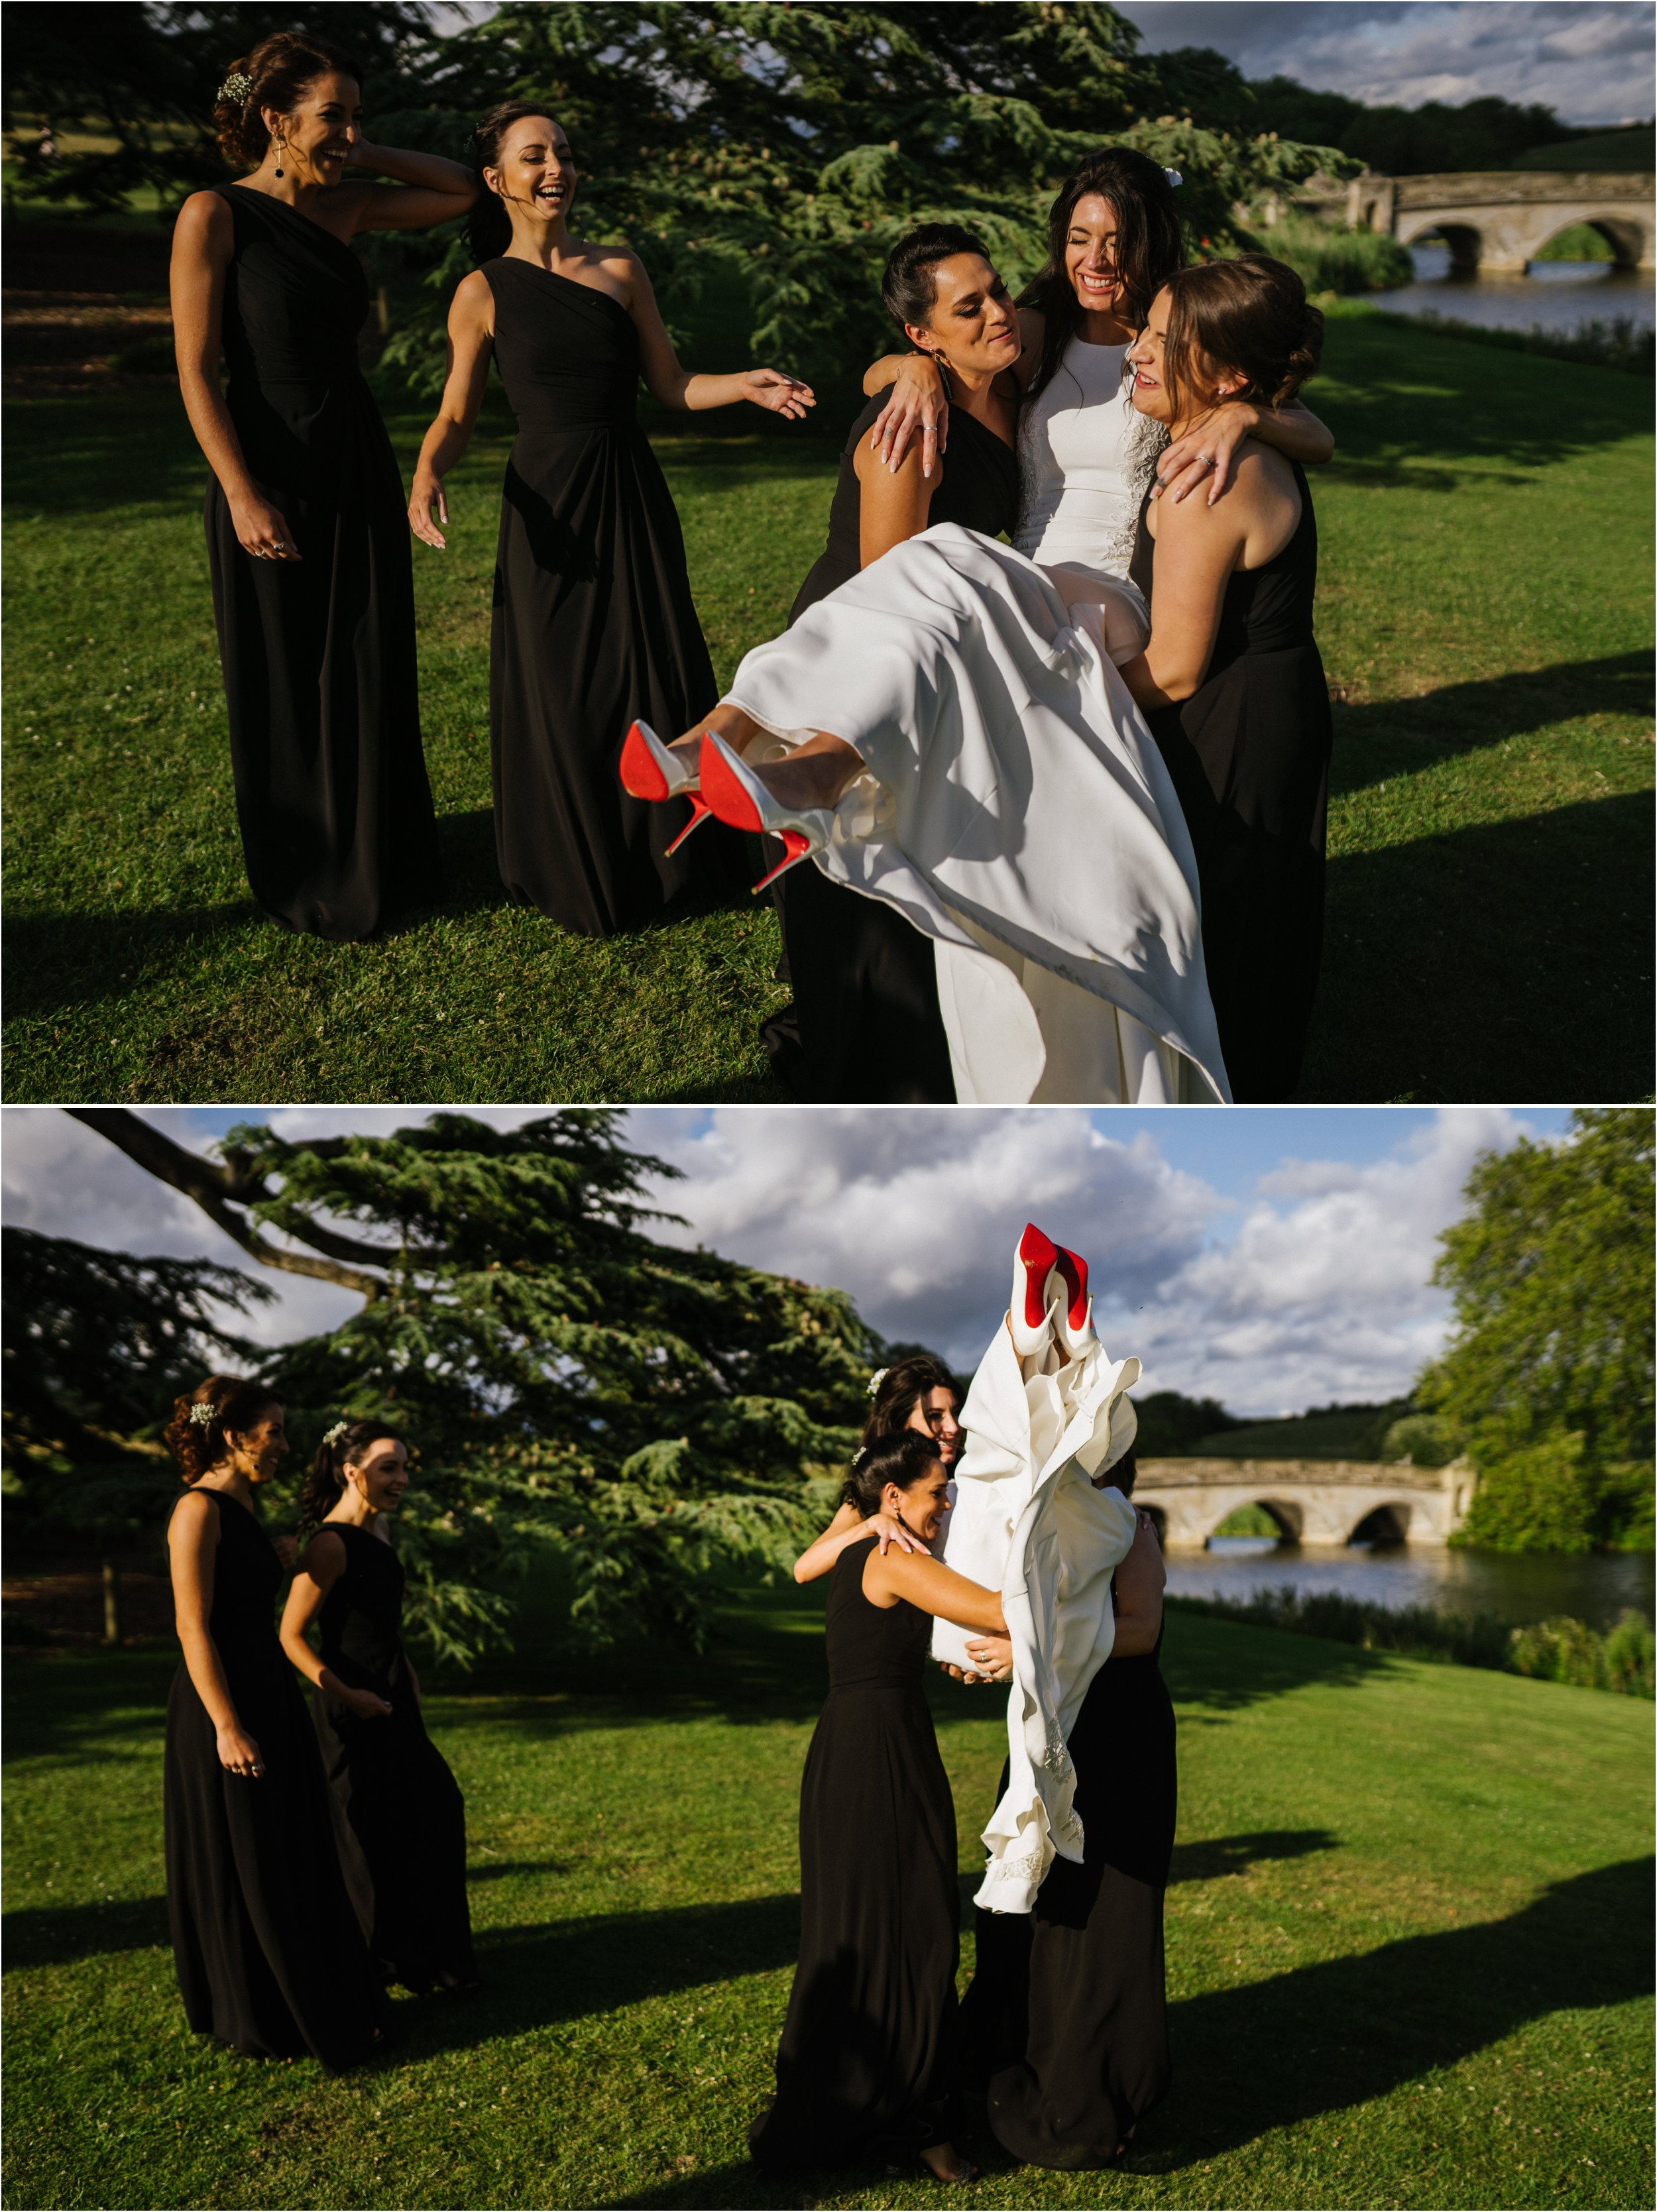 Compton Verney wedding photography_0135.jpg